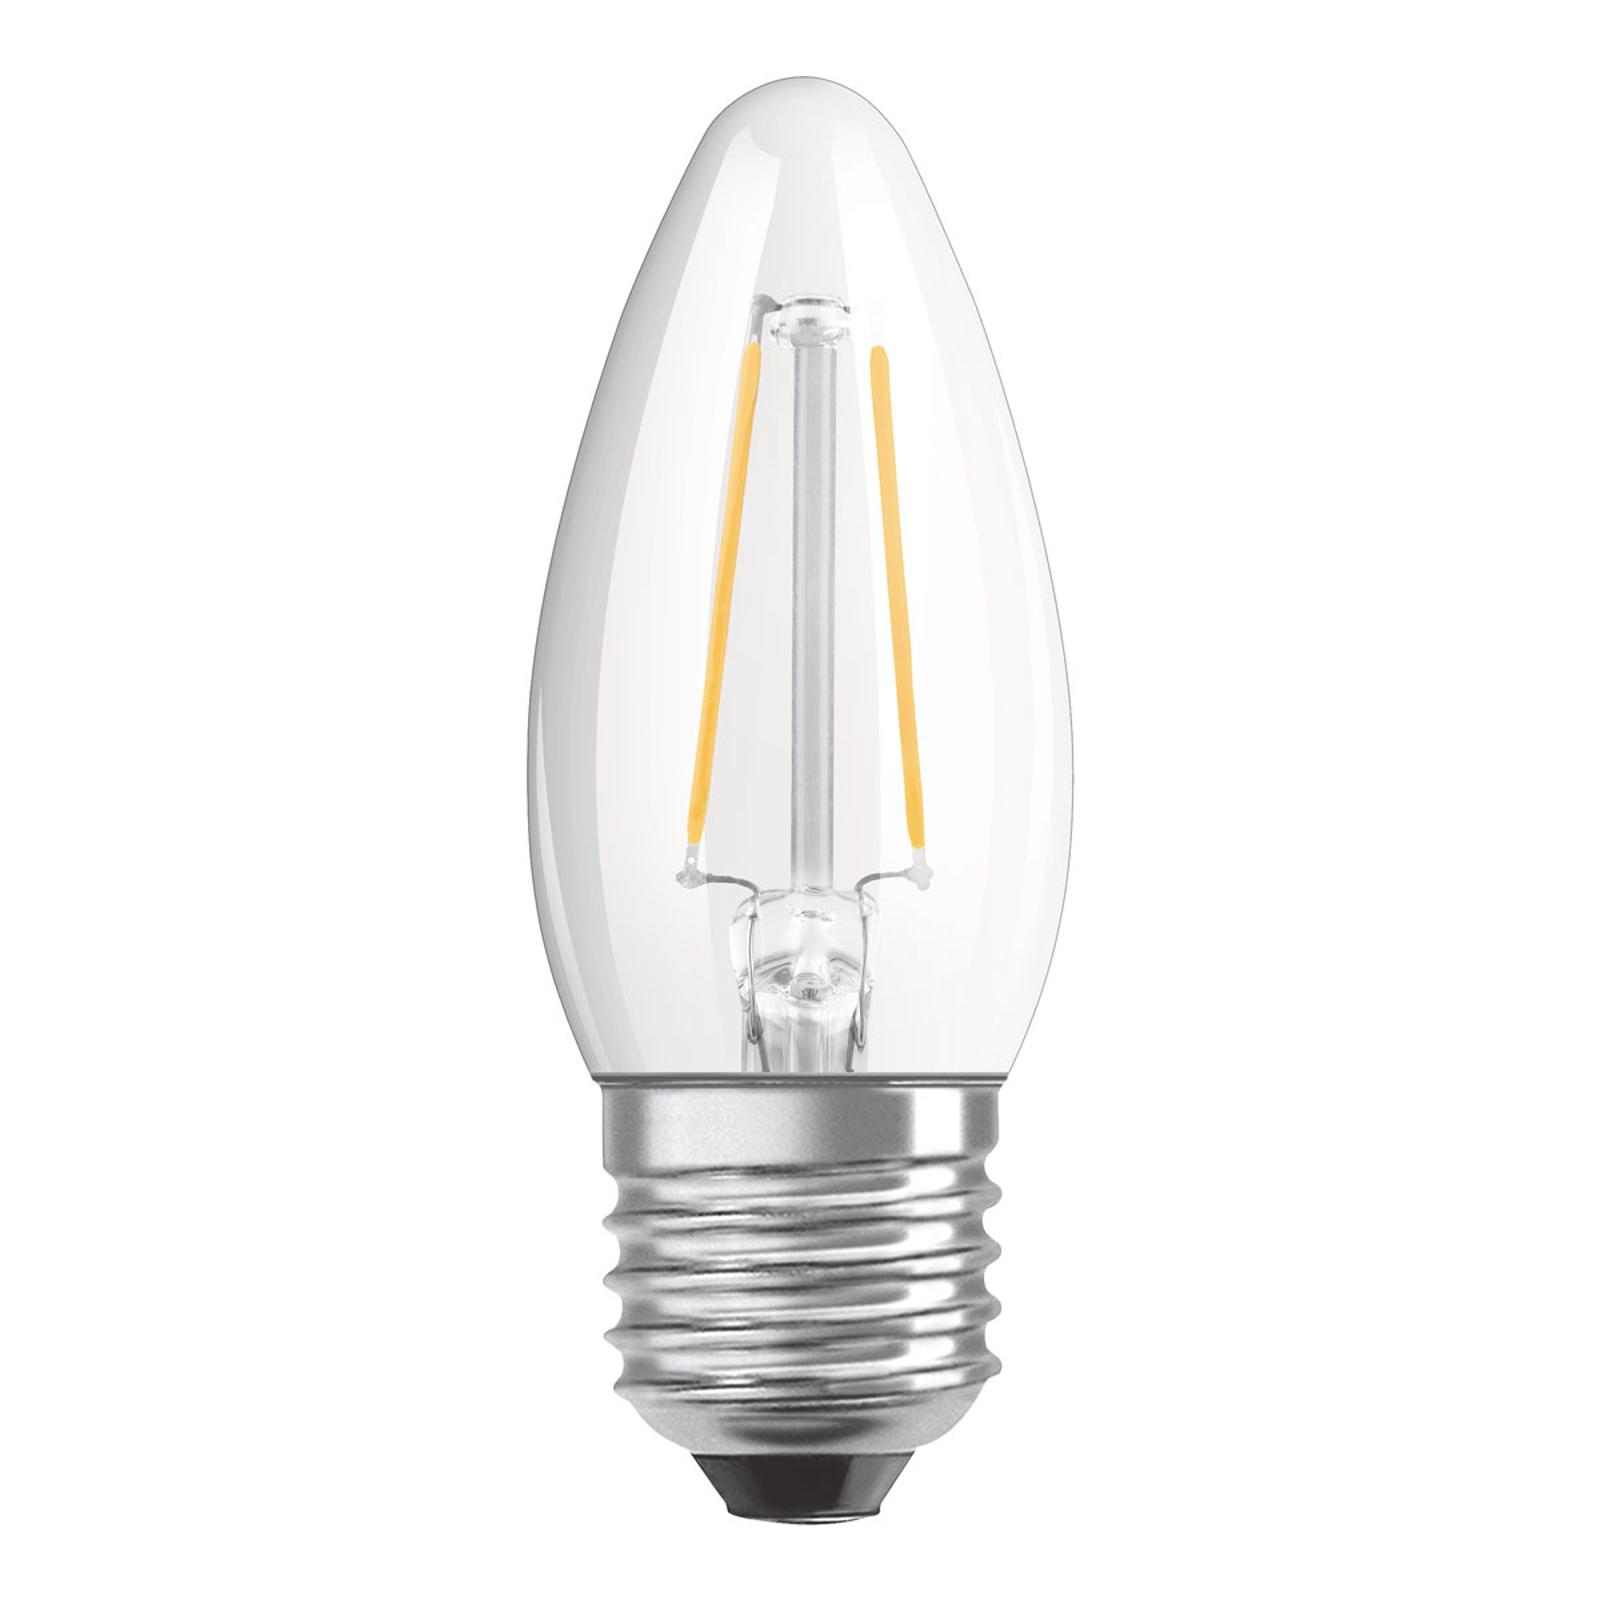 OSRAM-LED-kynttilä E27 4W Classic B 2 700 K kirkas